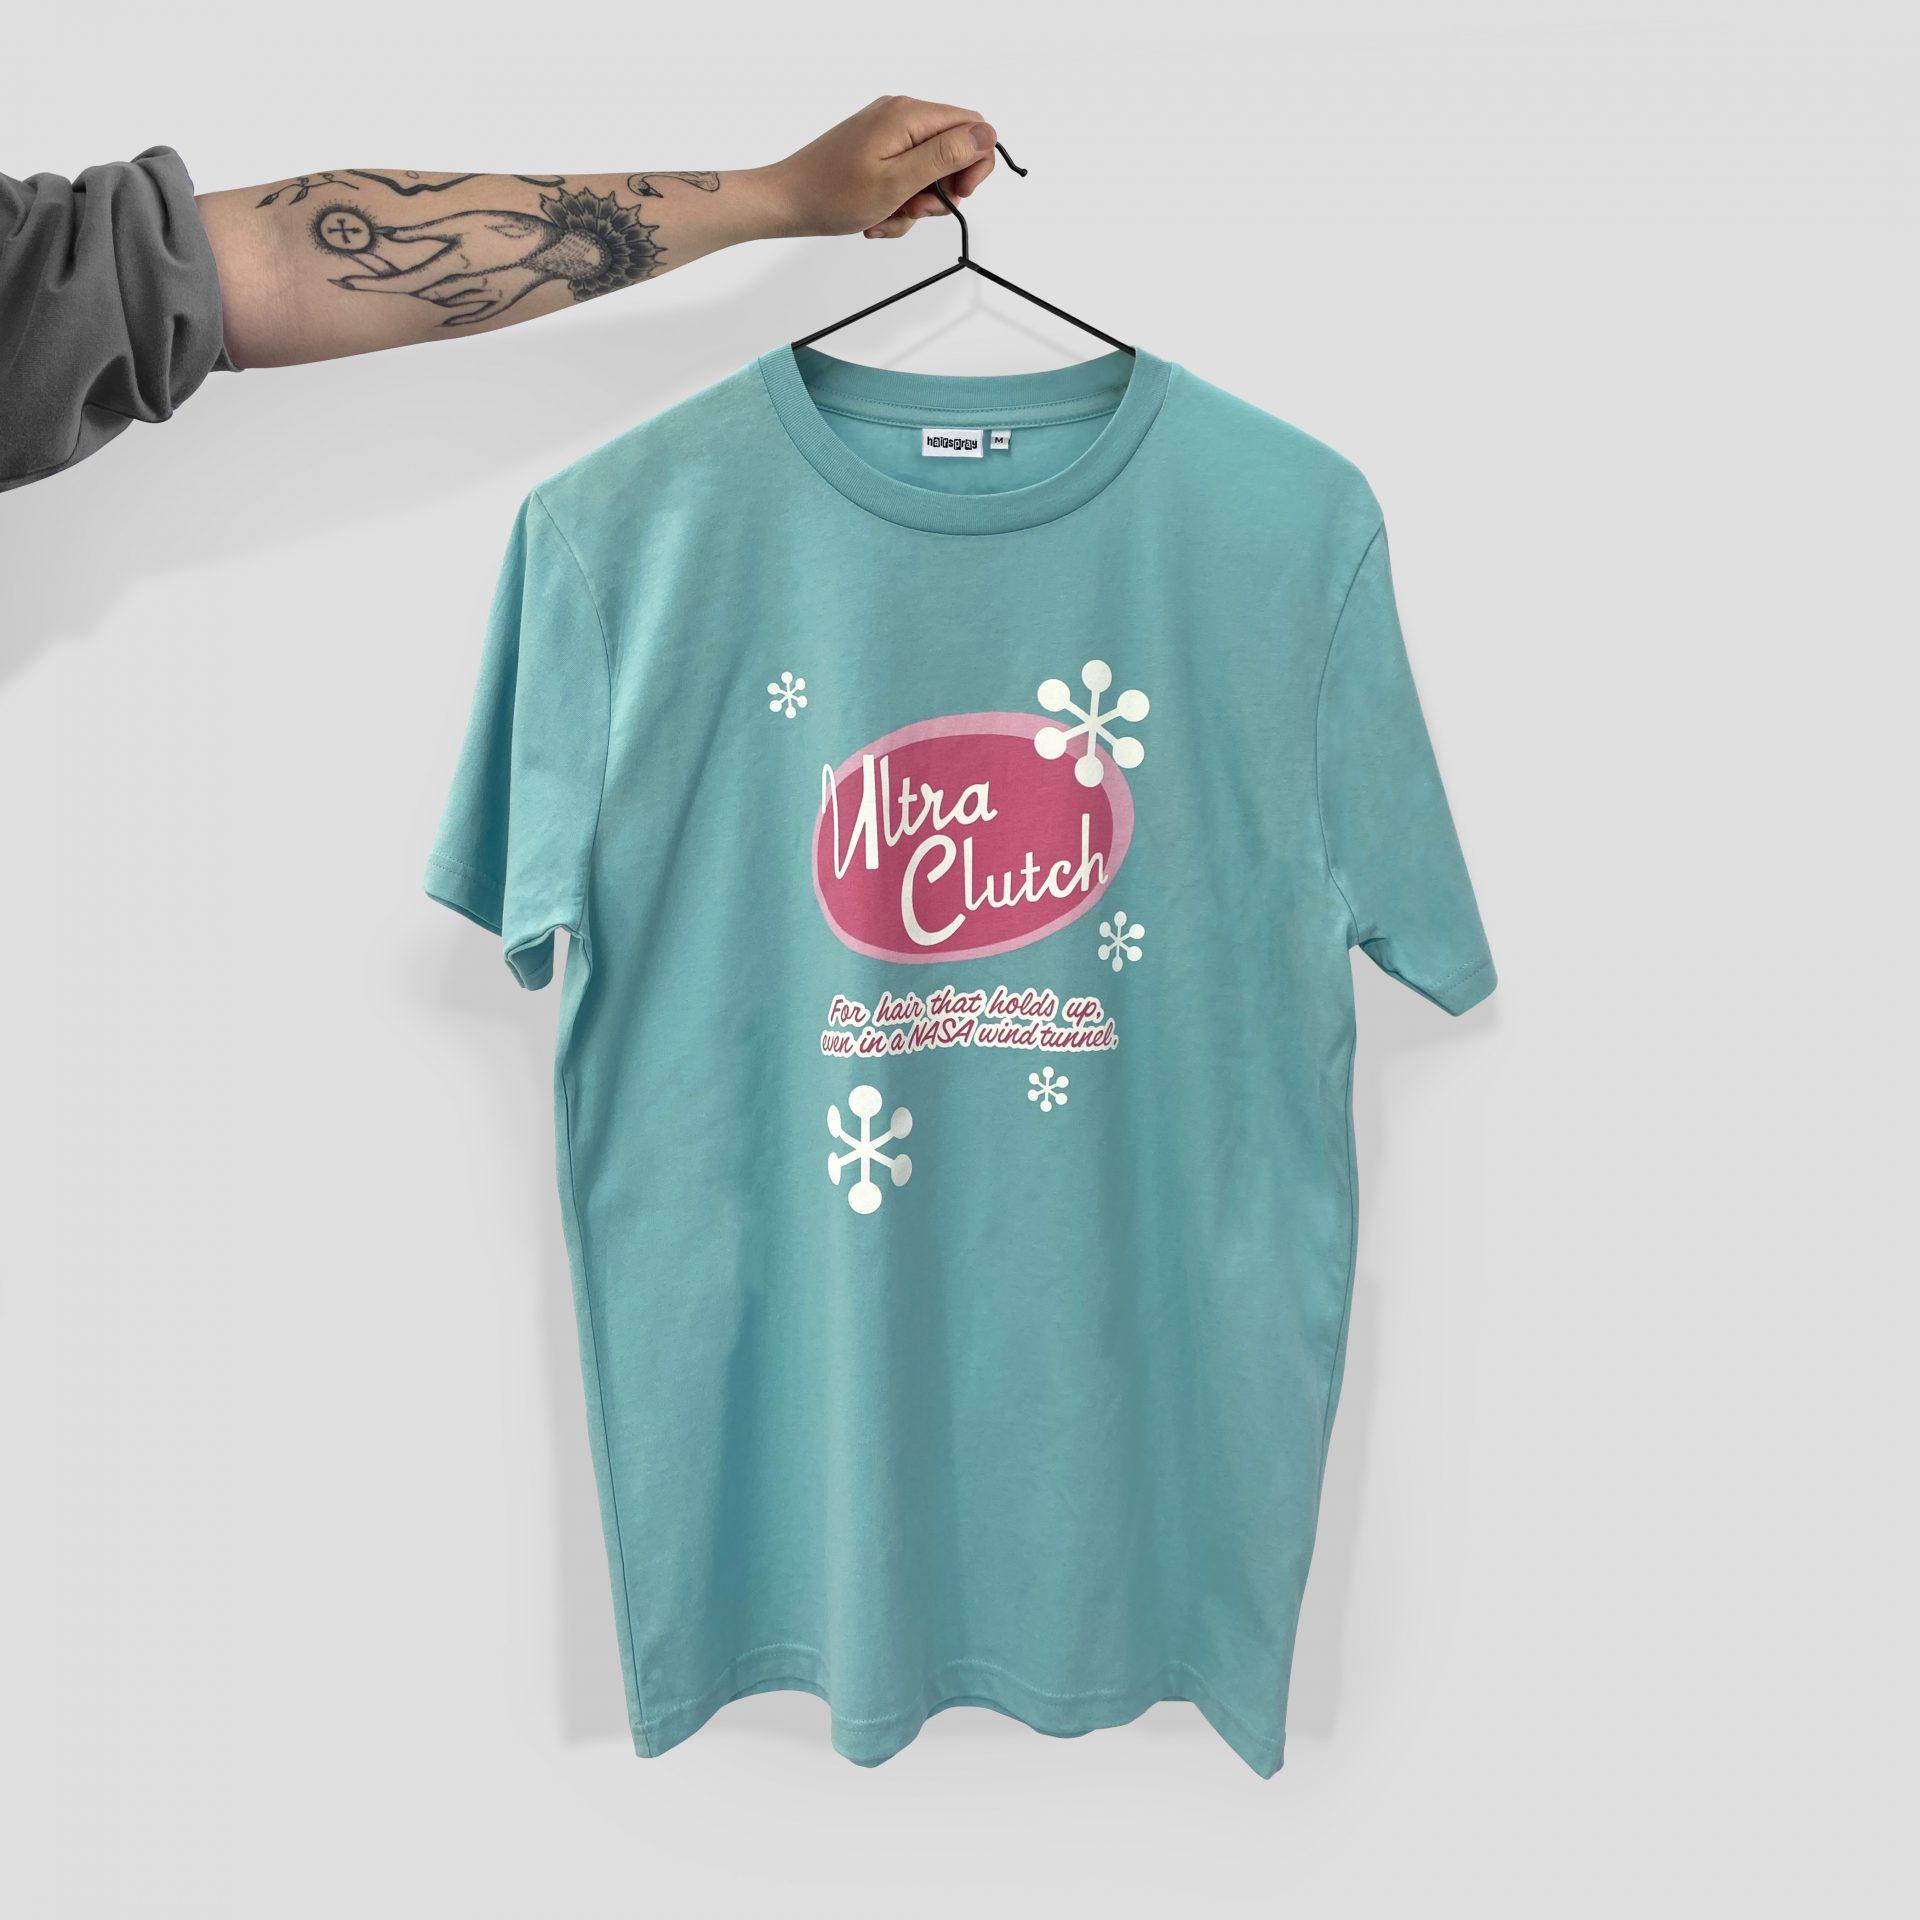 Screen printed Ultra Clutch T-shirt